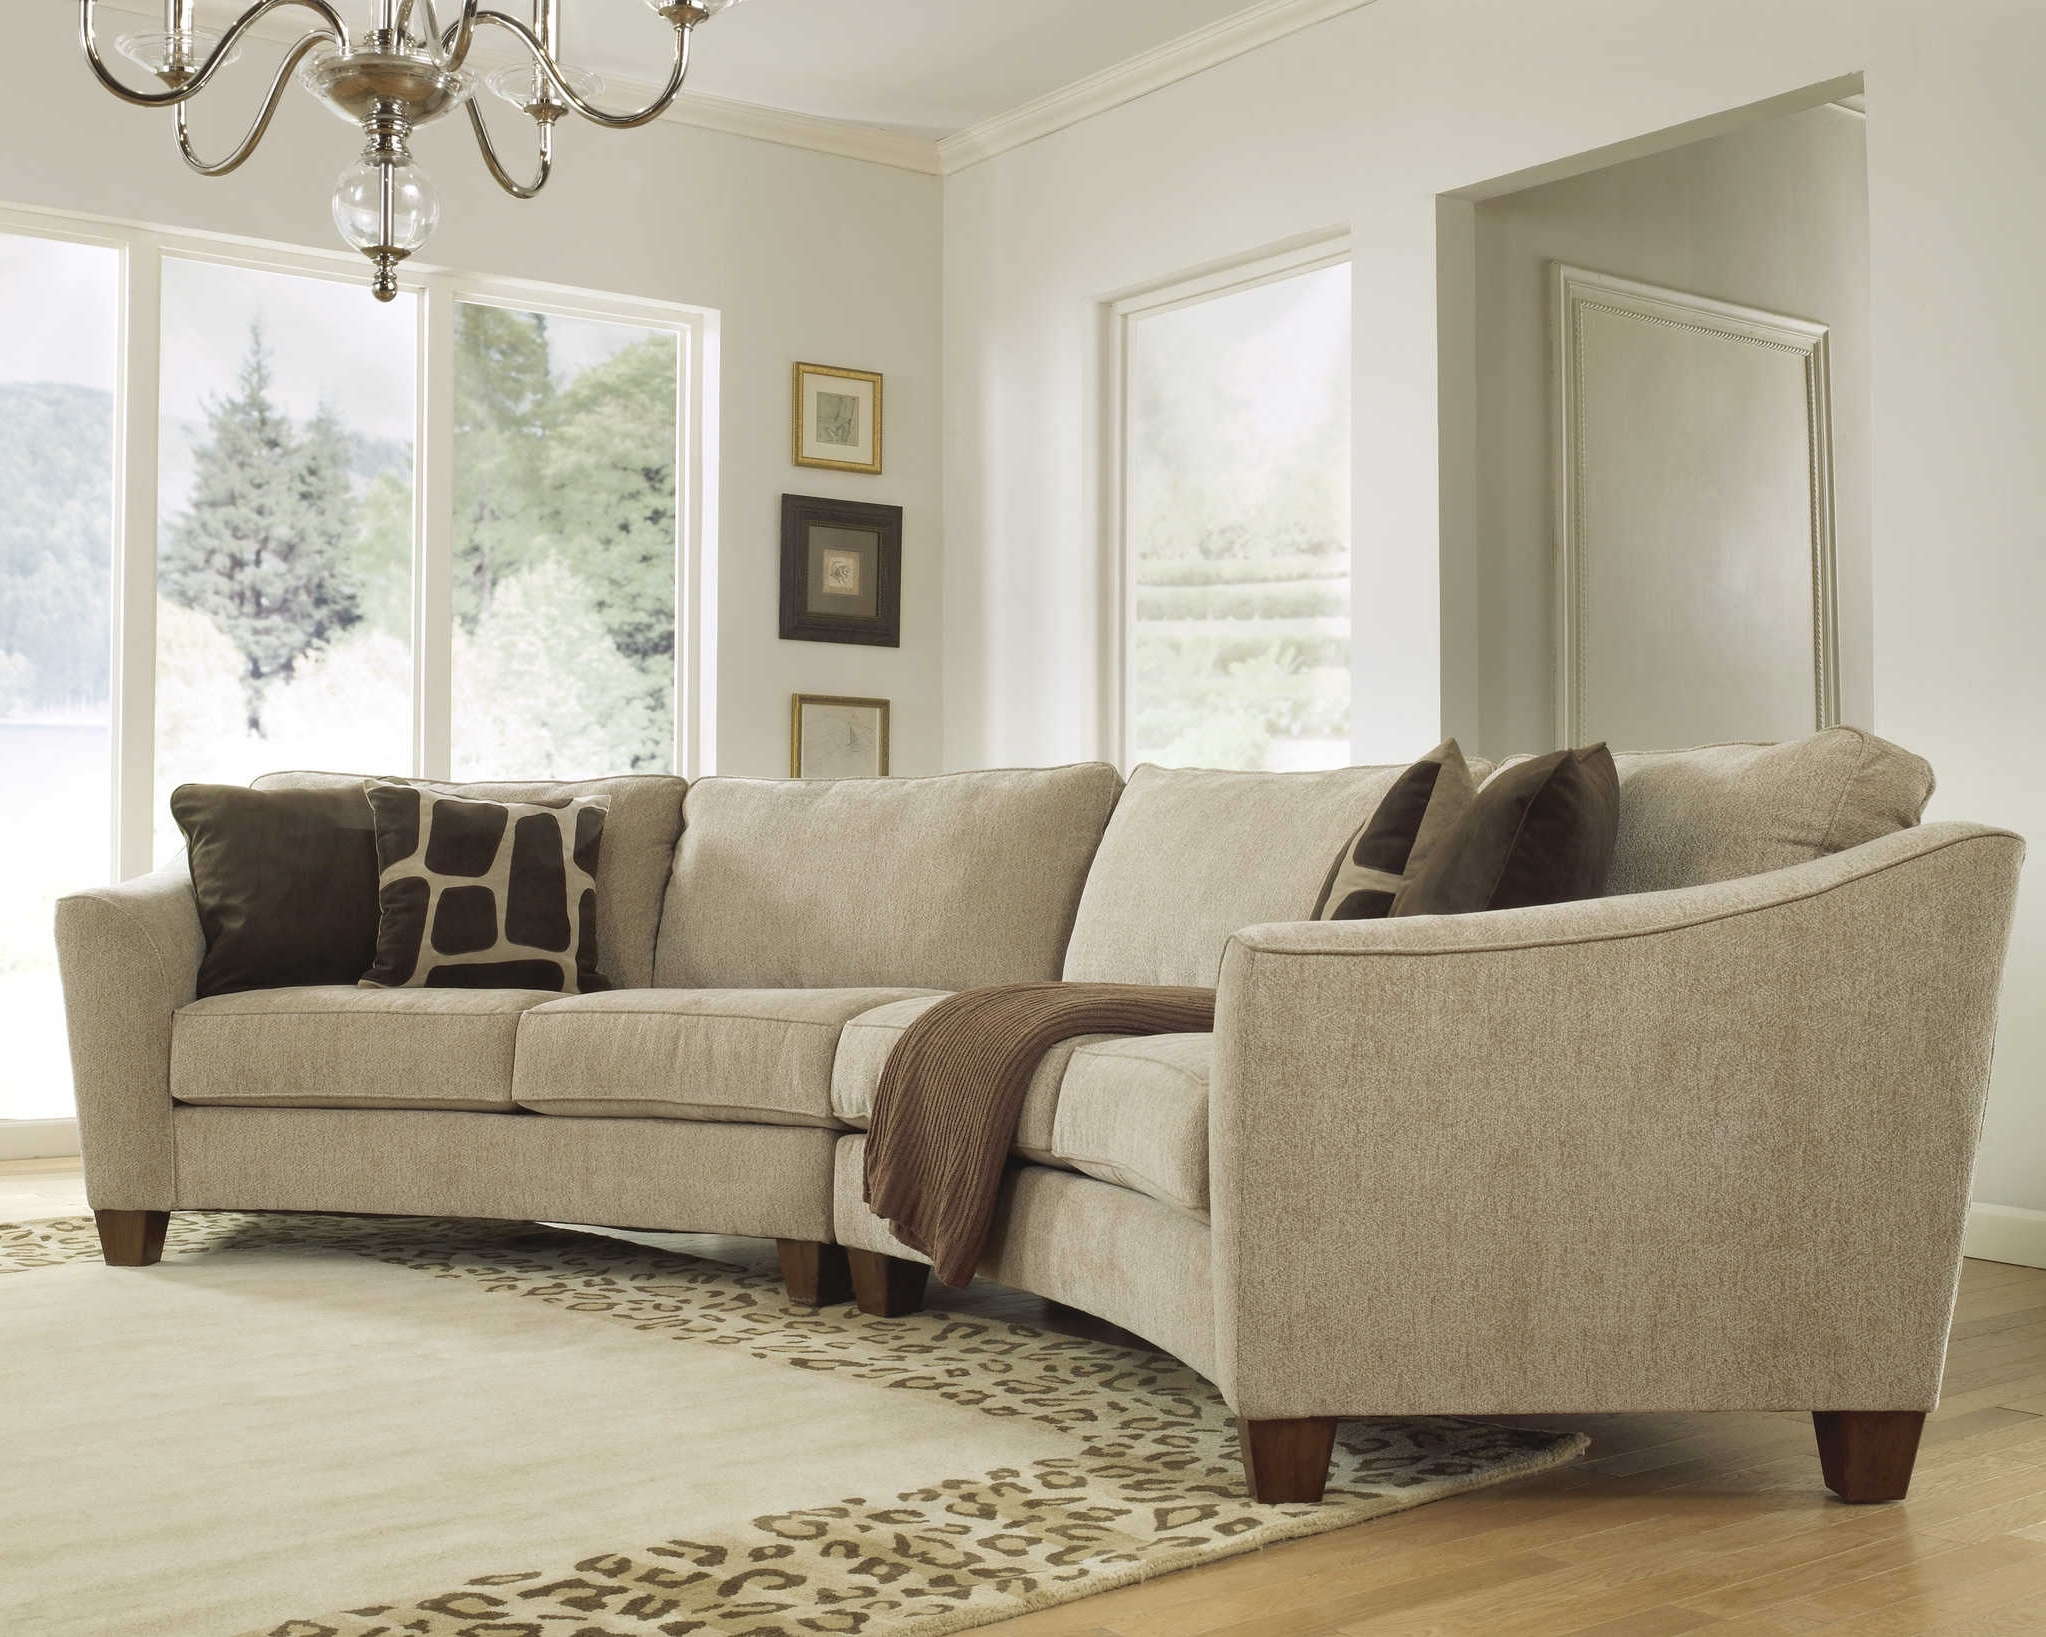 Favorite Wichita Ks Sectional Sofas With Bedroom: Ashley Furniture Wichita Ks Cozy Beautiful White Sofa (View 6 of 15)